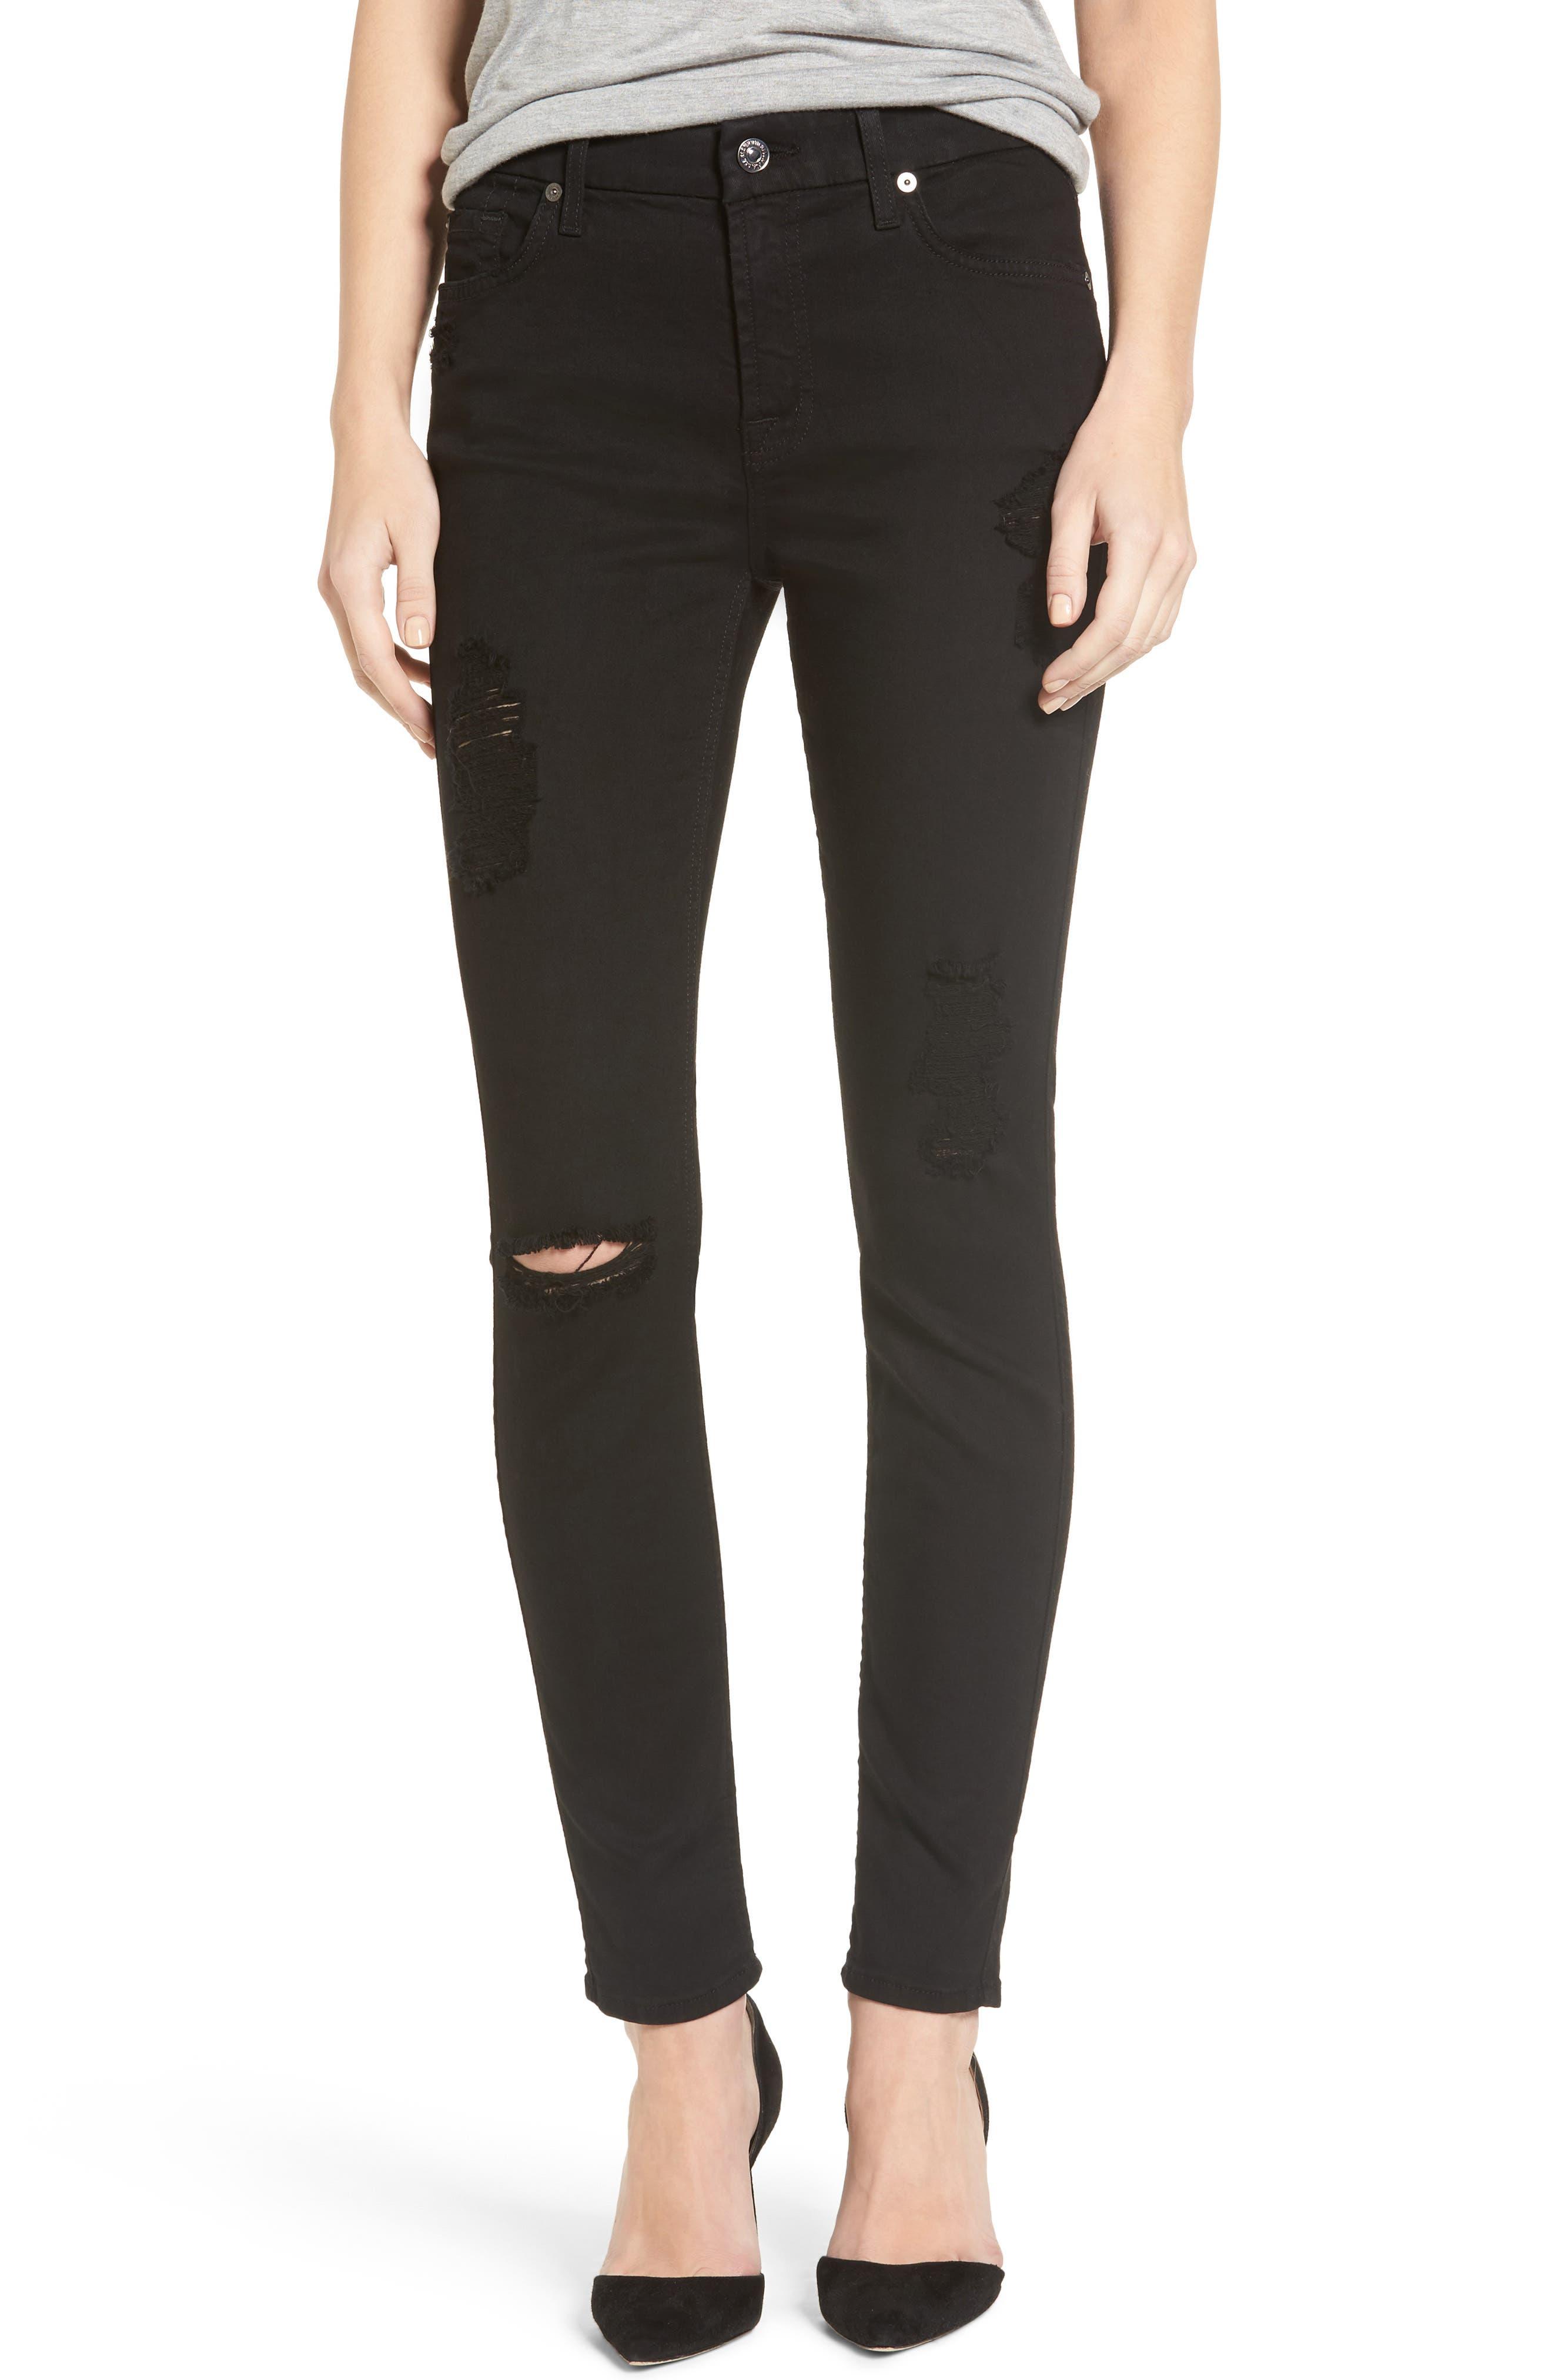 b(air) Ankle Skinny Jeans, Main, color, BAIR BLACK 3